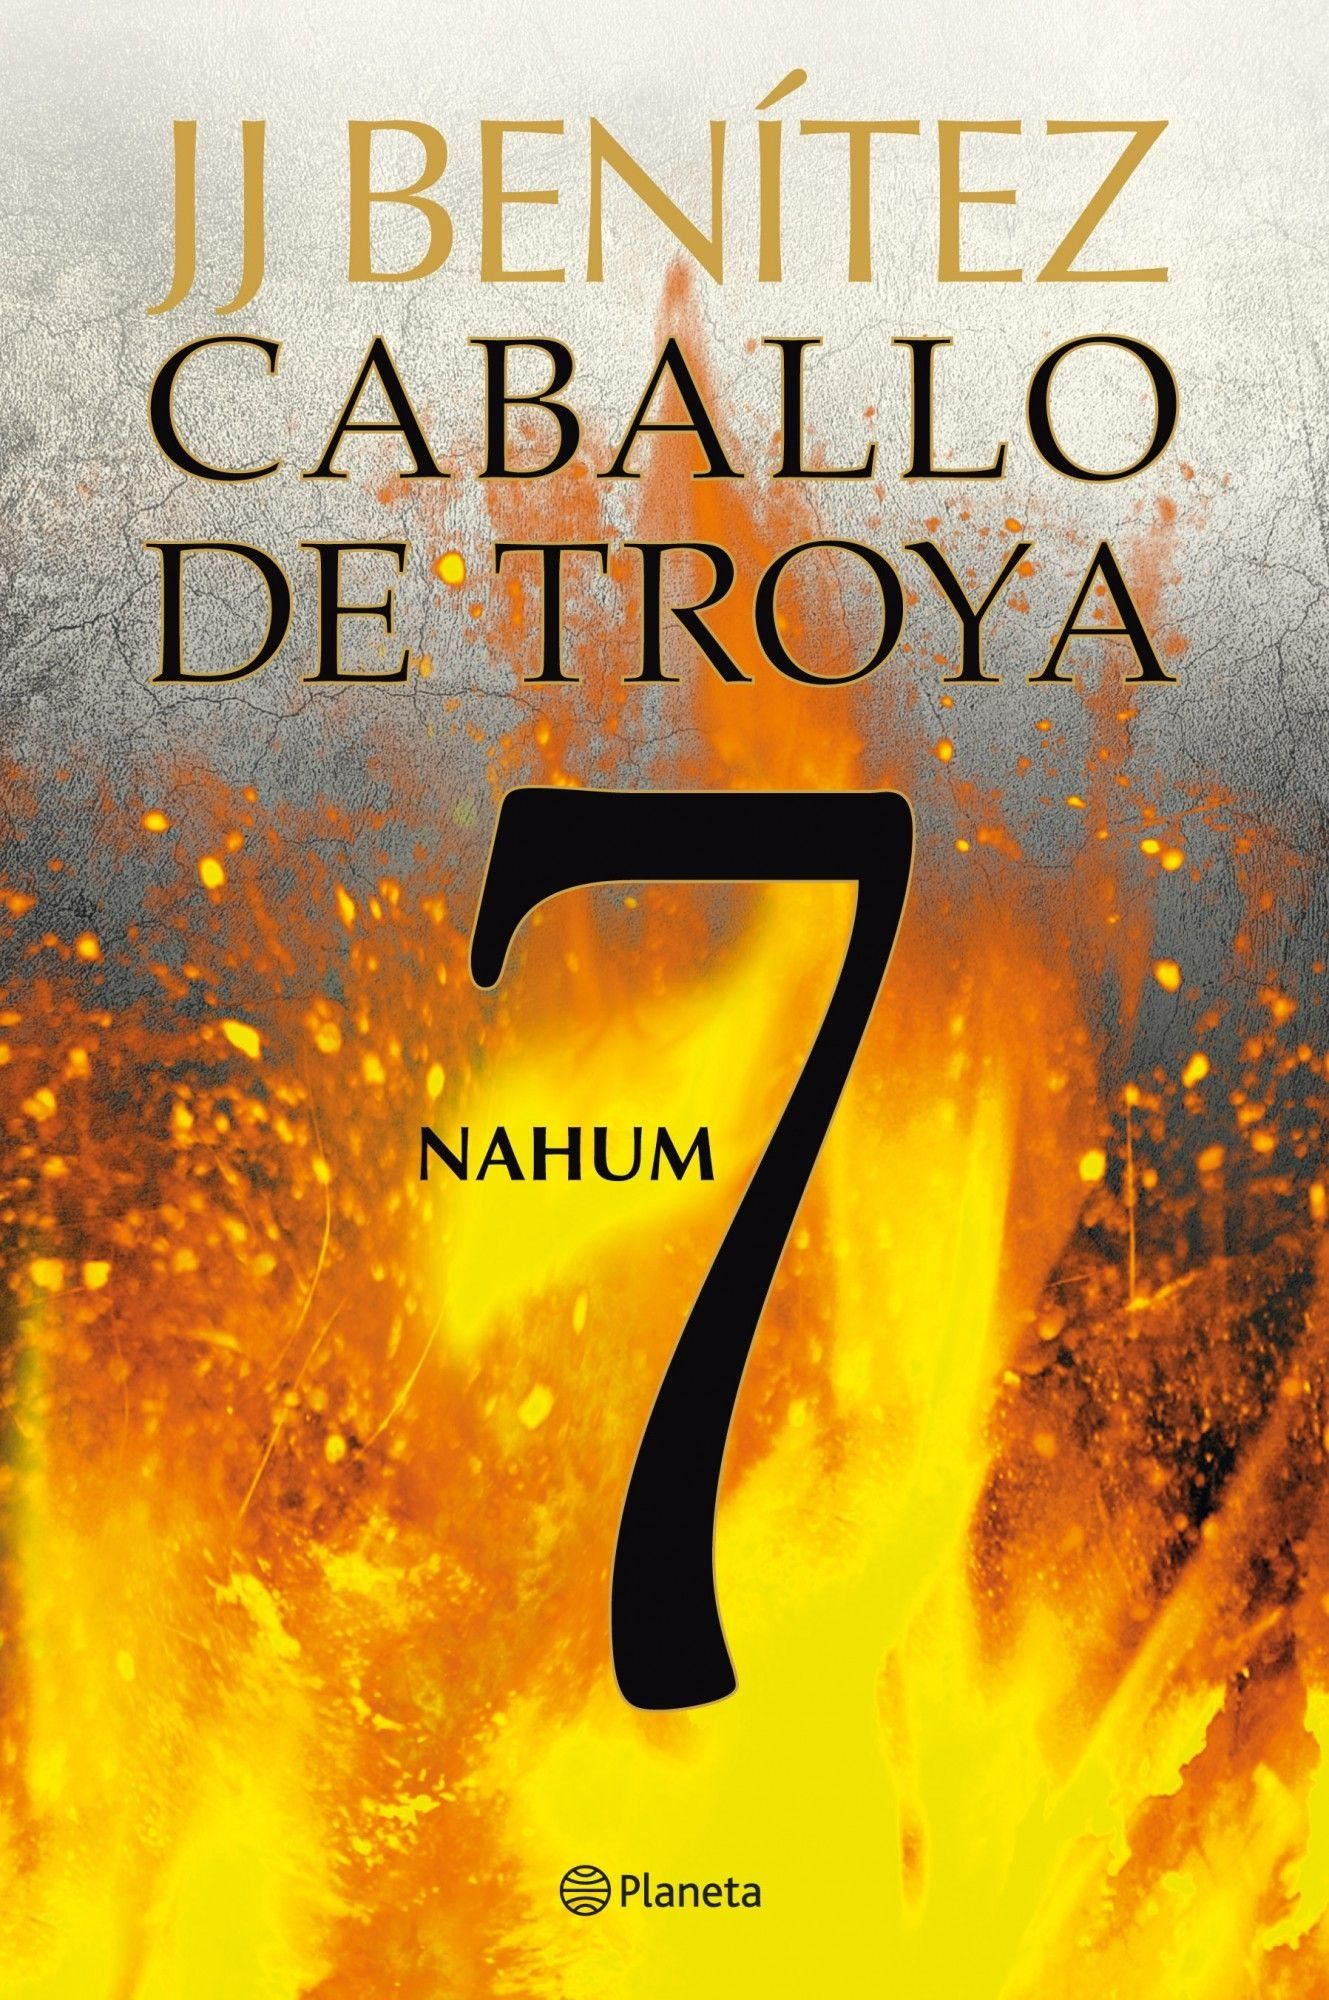 Nahum Caballo De Troya 7 Biblioteca J J Ben ªtez De